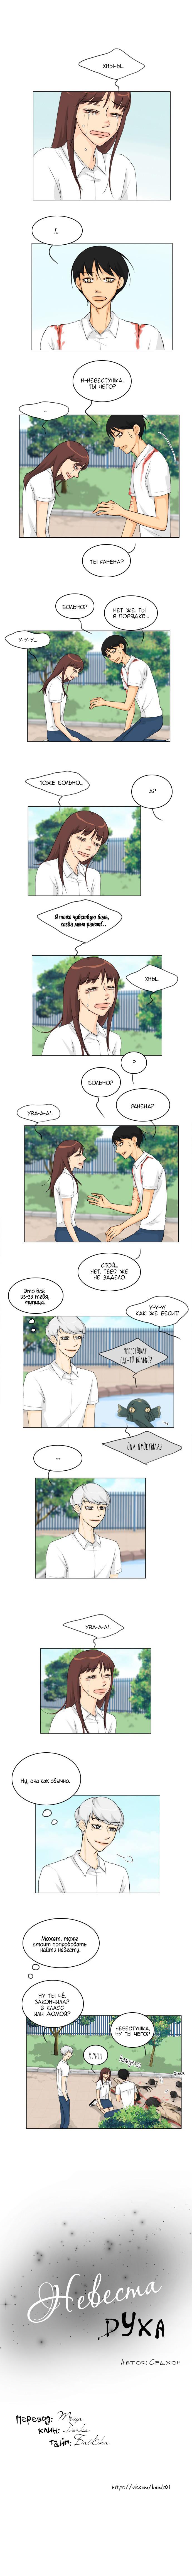 https://r1.ninemanga.com/comics/pic2/8/31048/426365/1535044475800.jpg Page 4